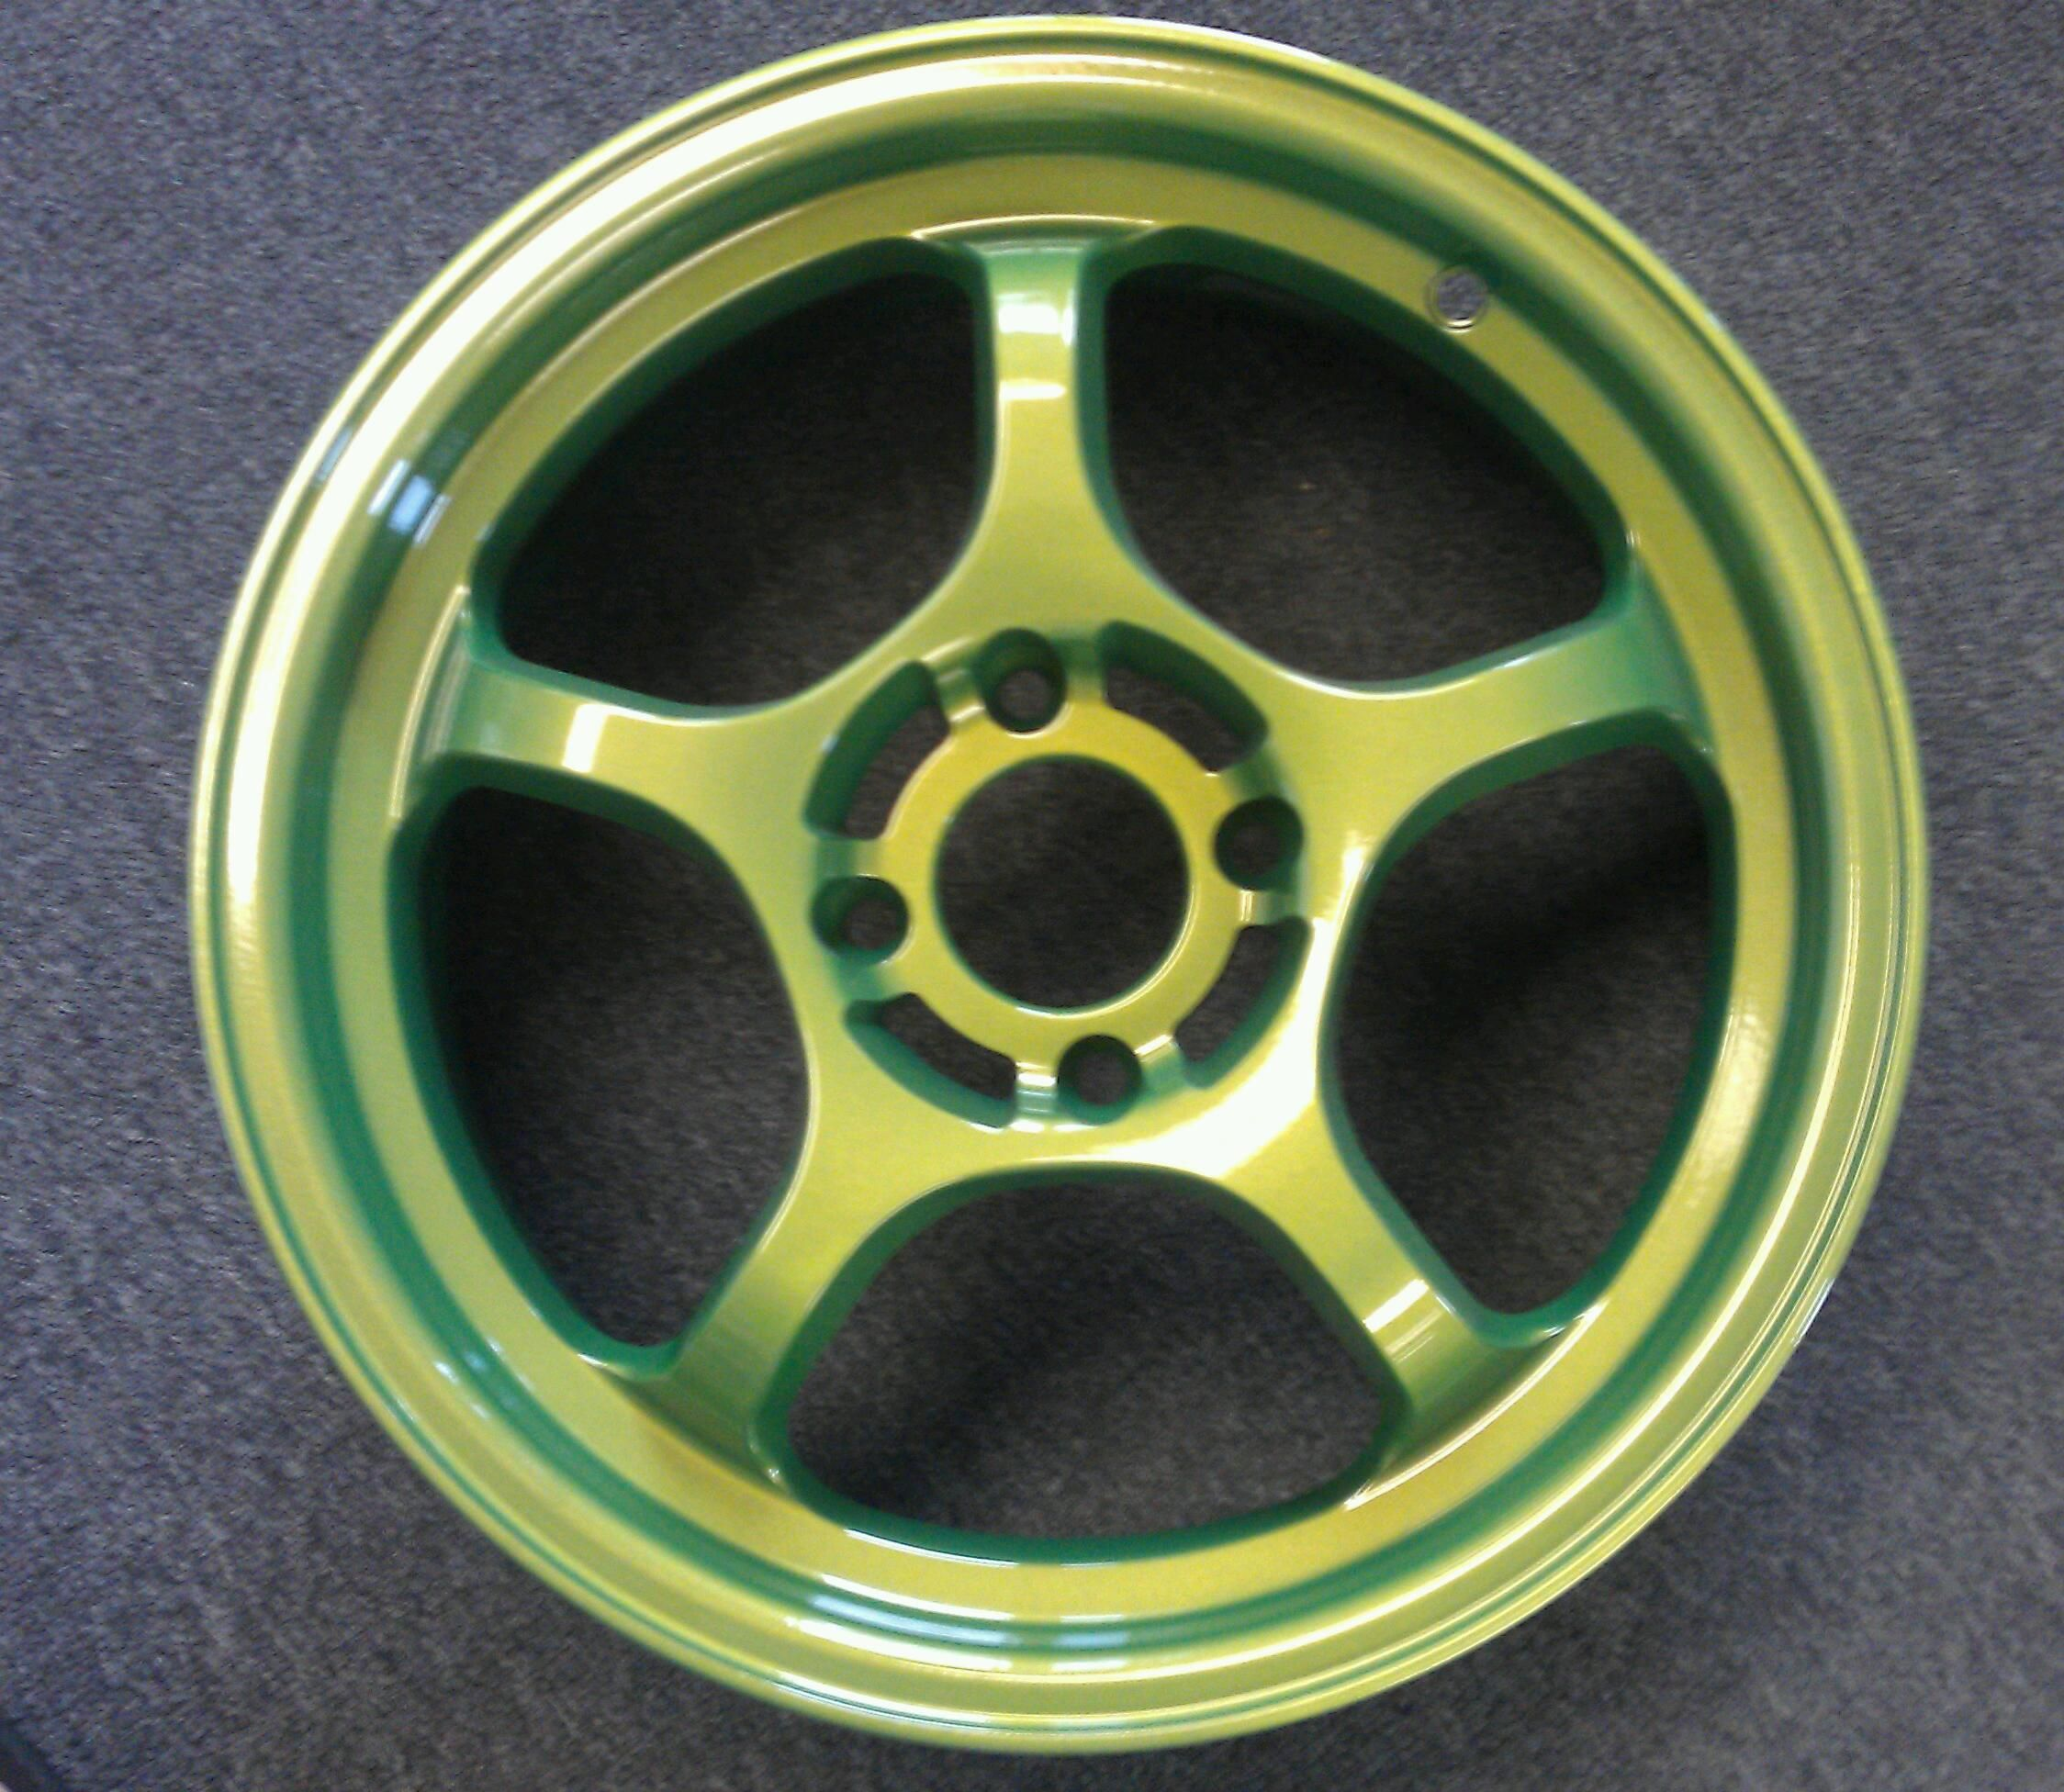 AntiFreeze Green Powder Coated Wheel by B and B Powder